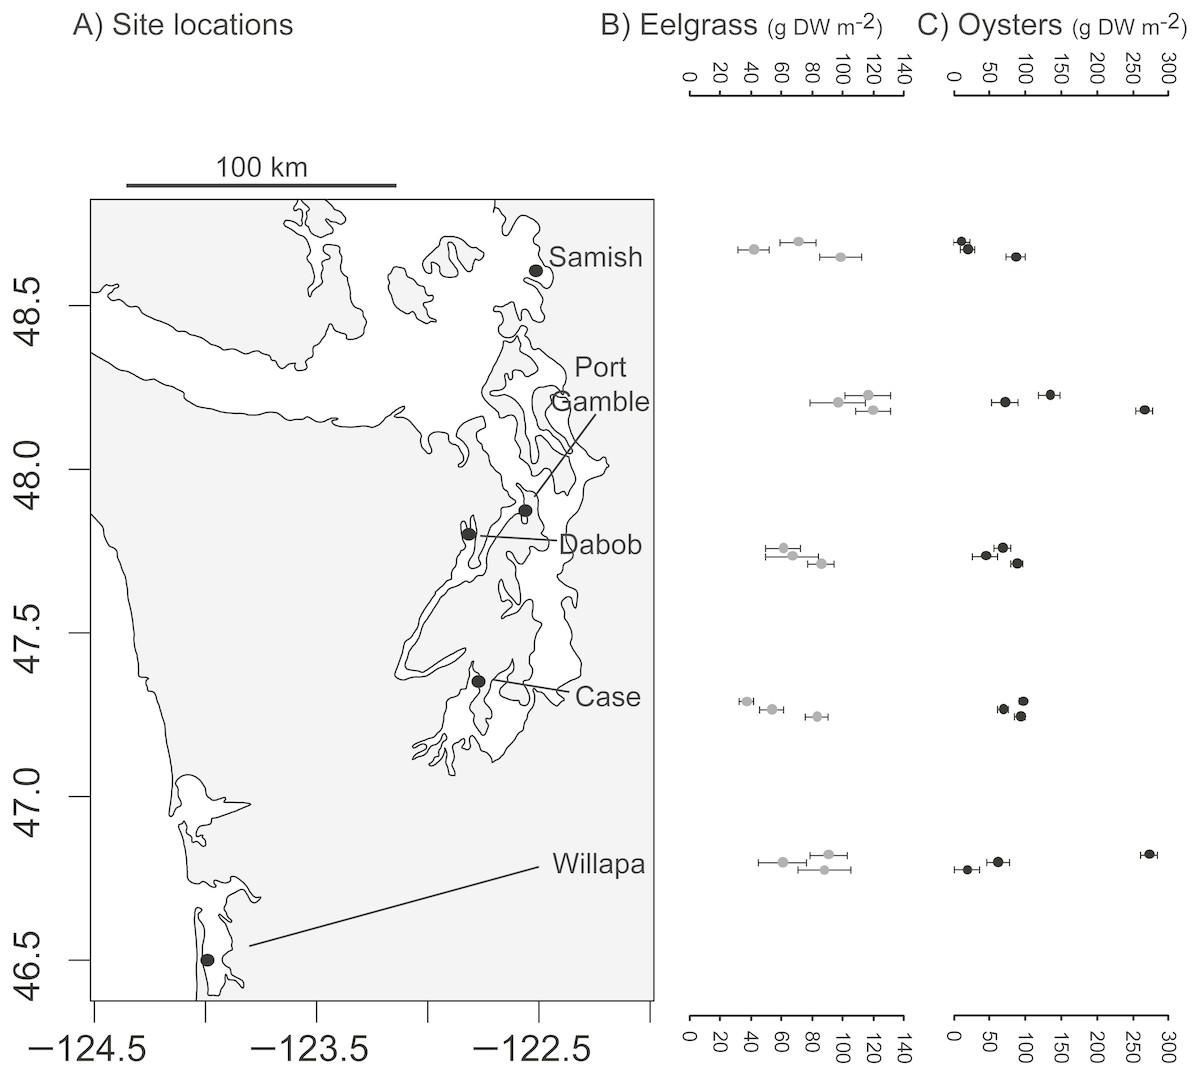 Comparison of shallow-water seston among biogenic habitats